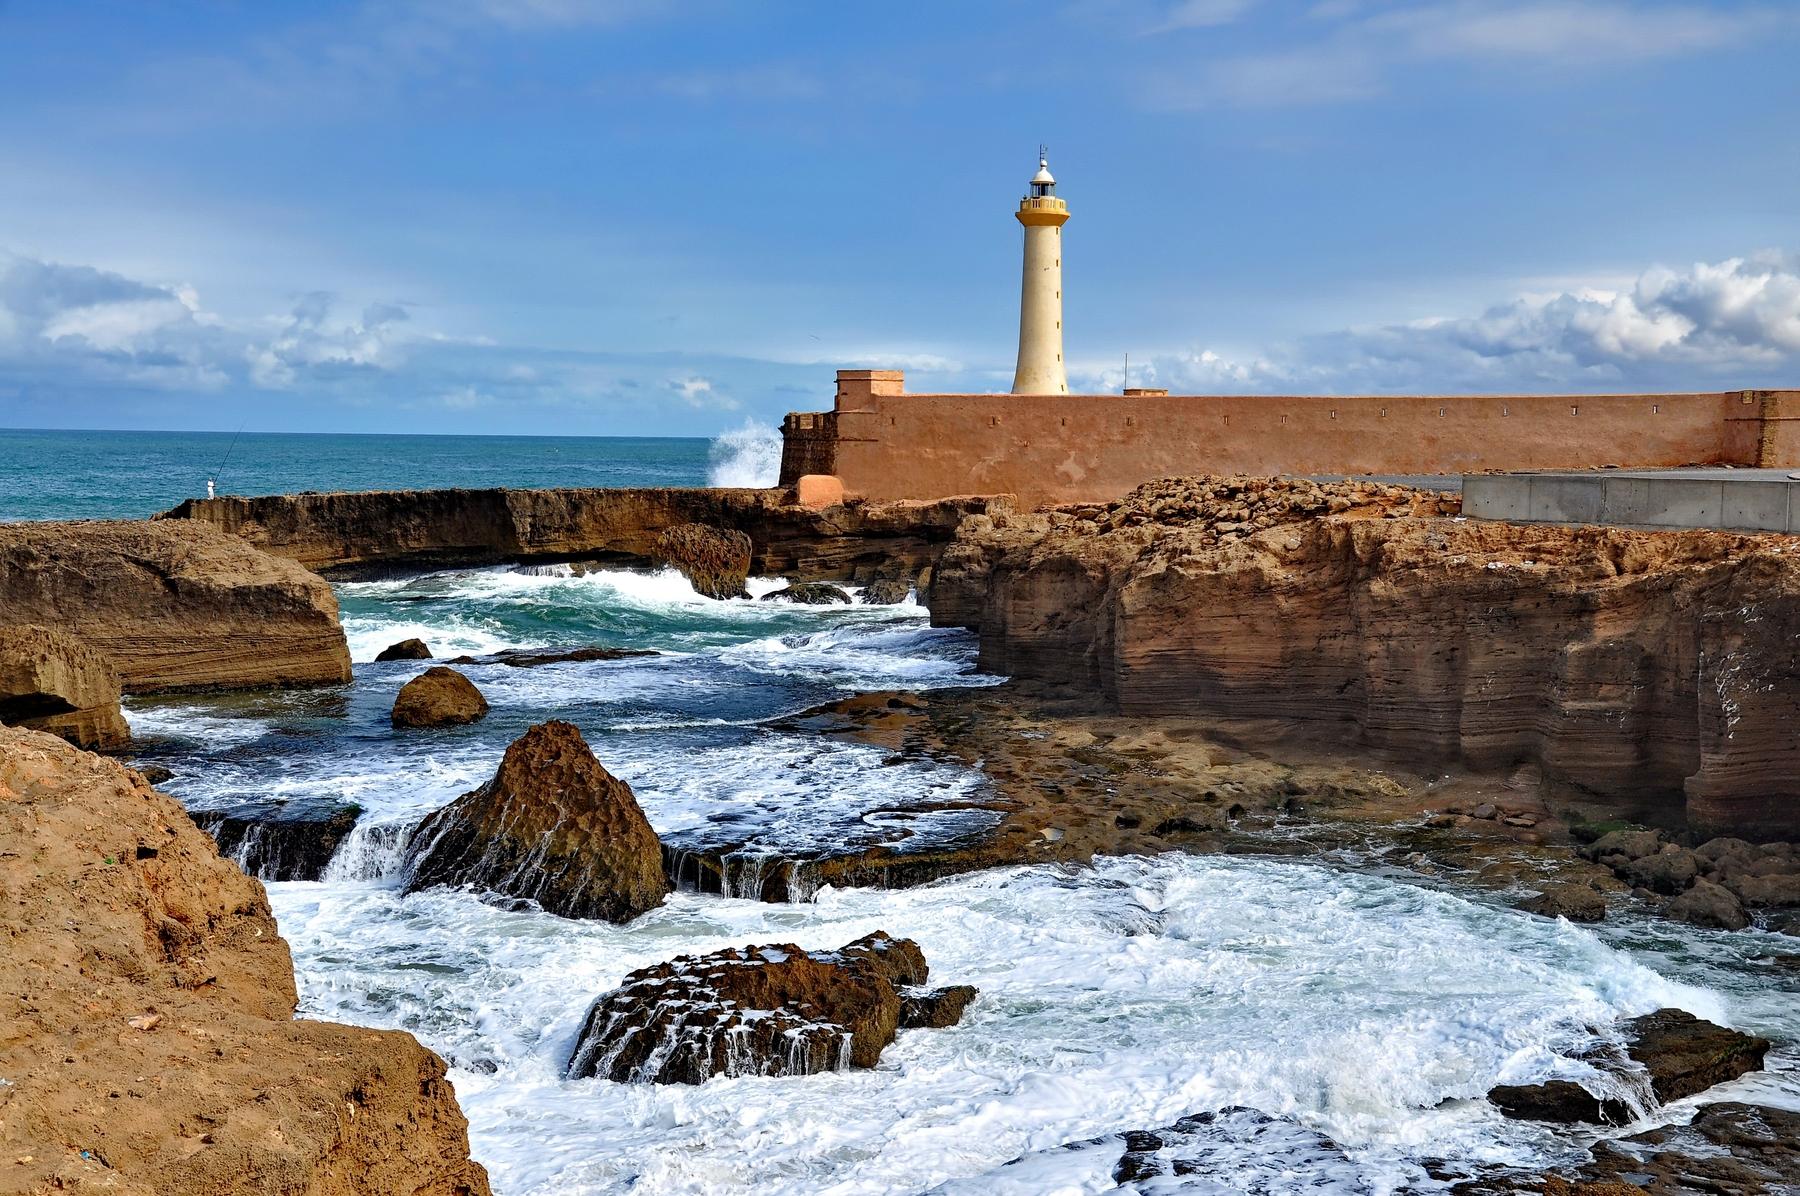 coastline in Morocco